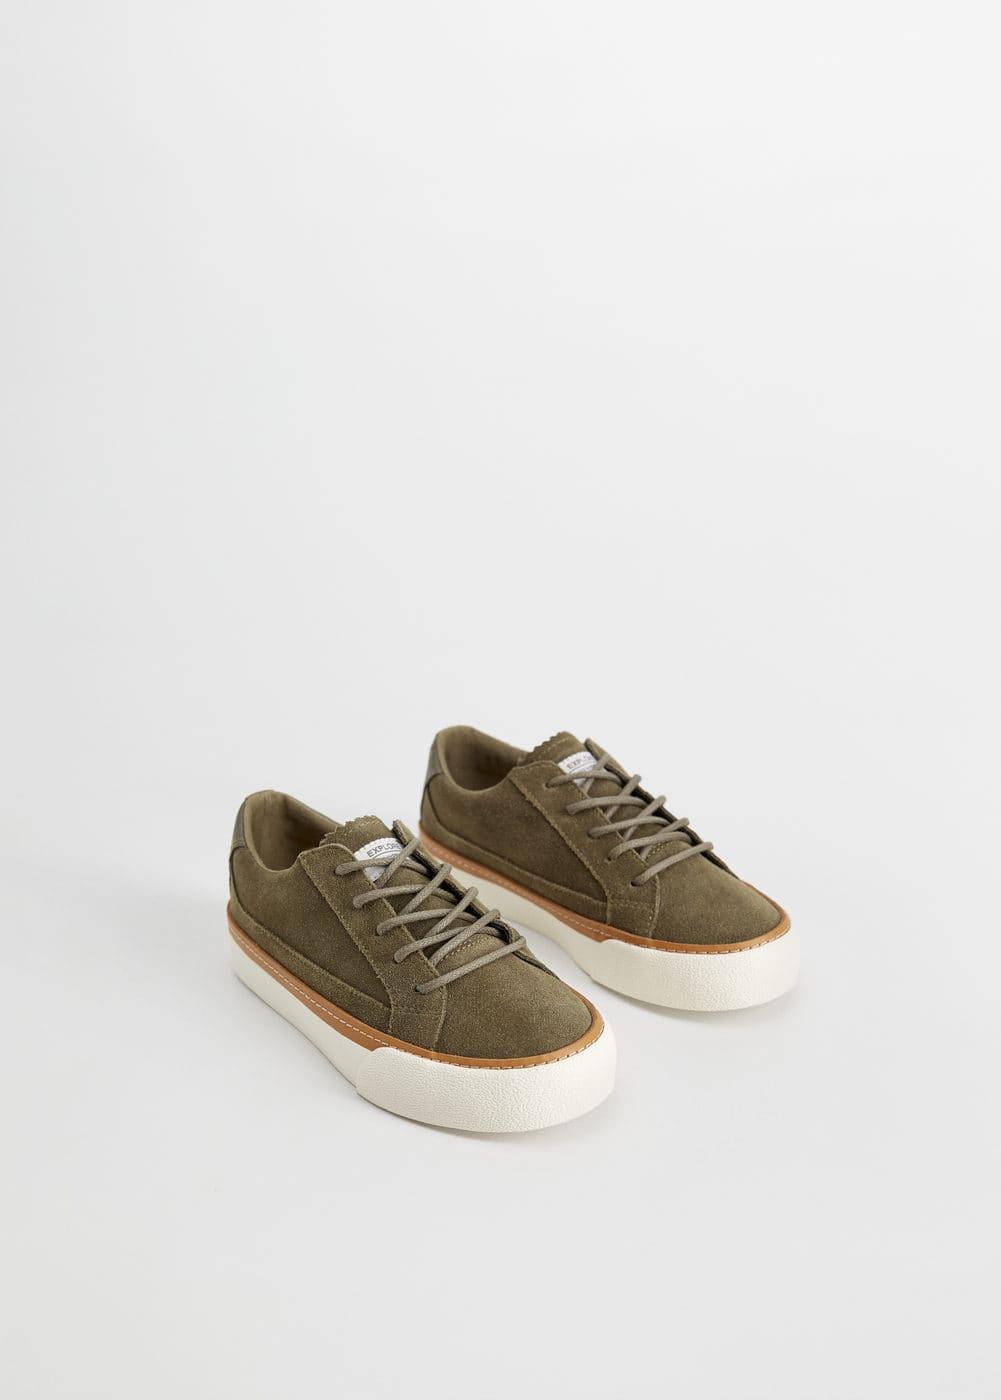 o-glen:zapato deportivo serraje